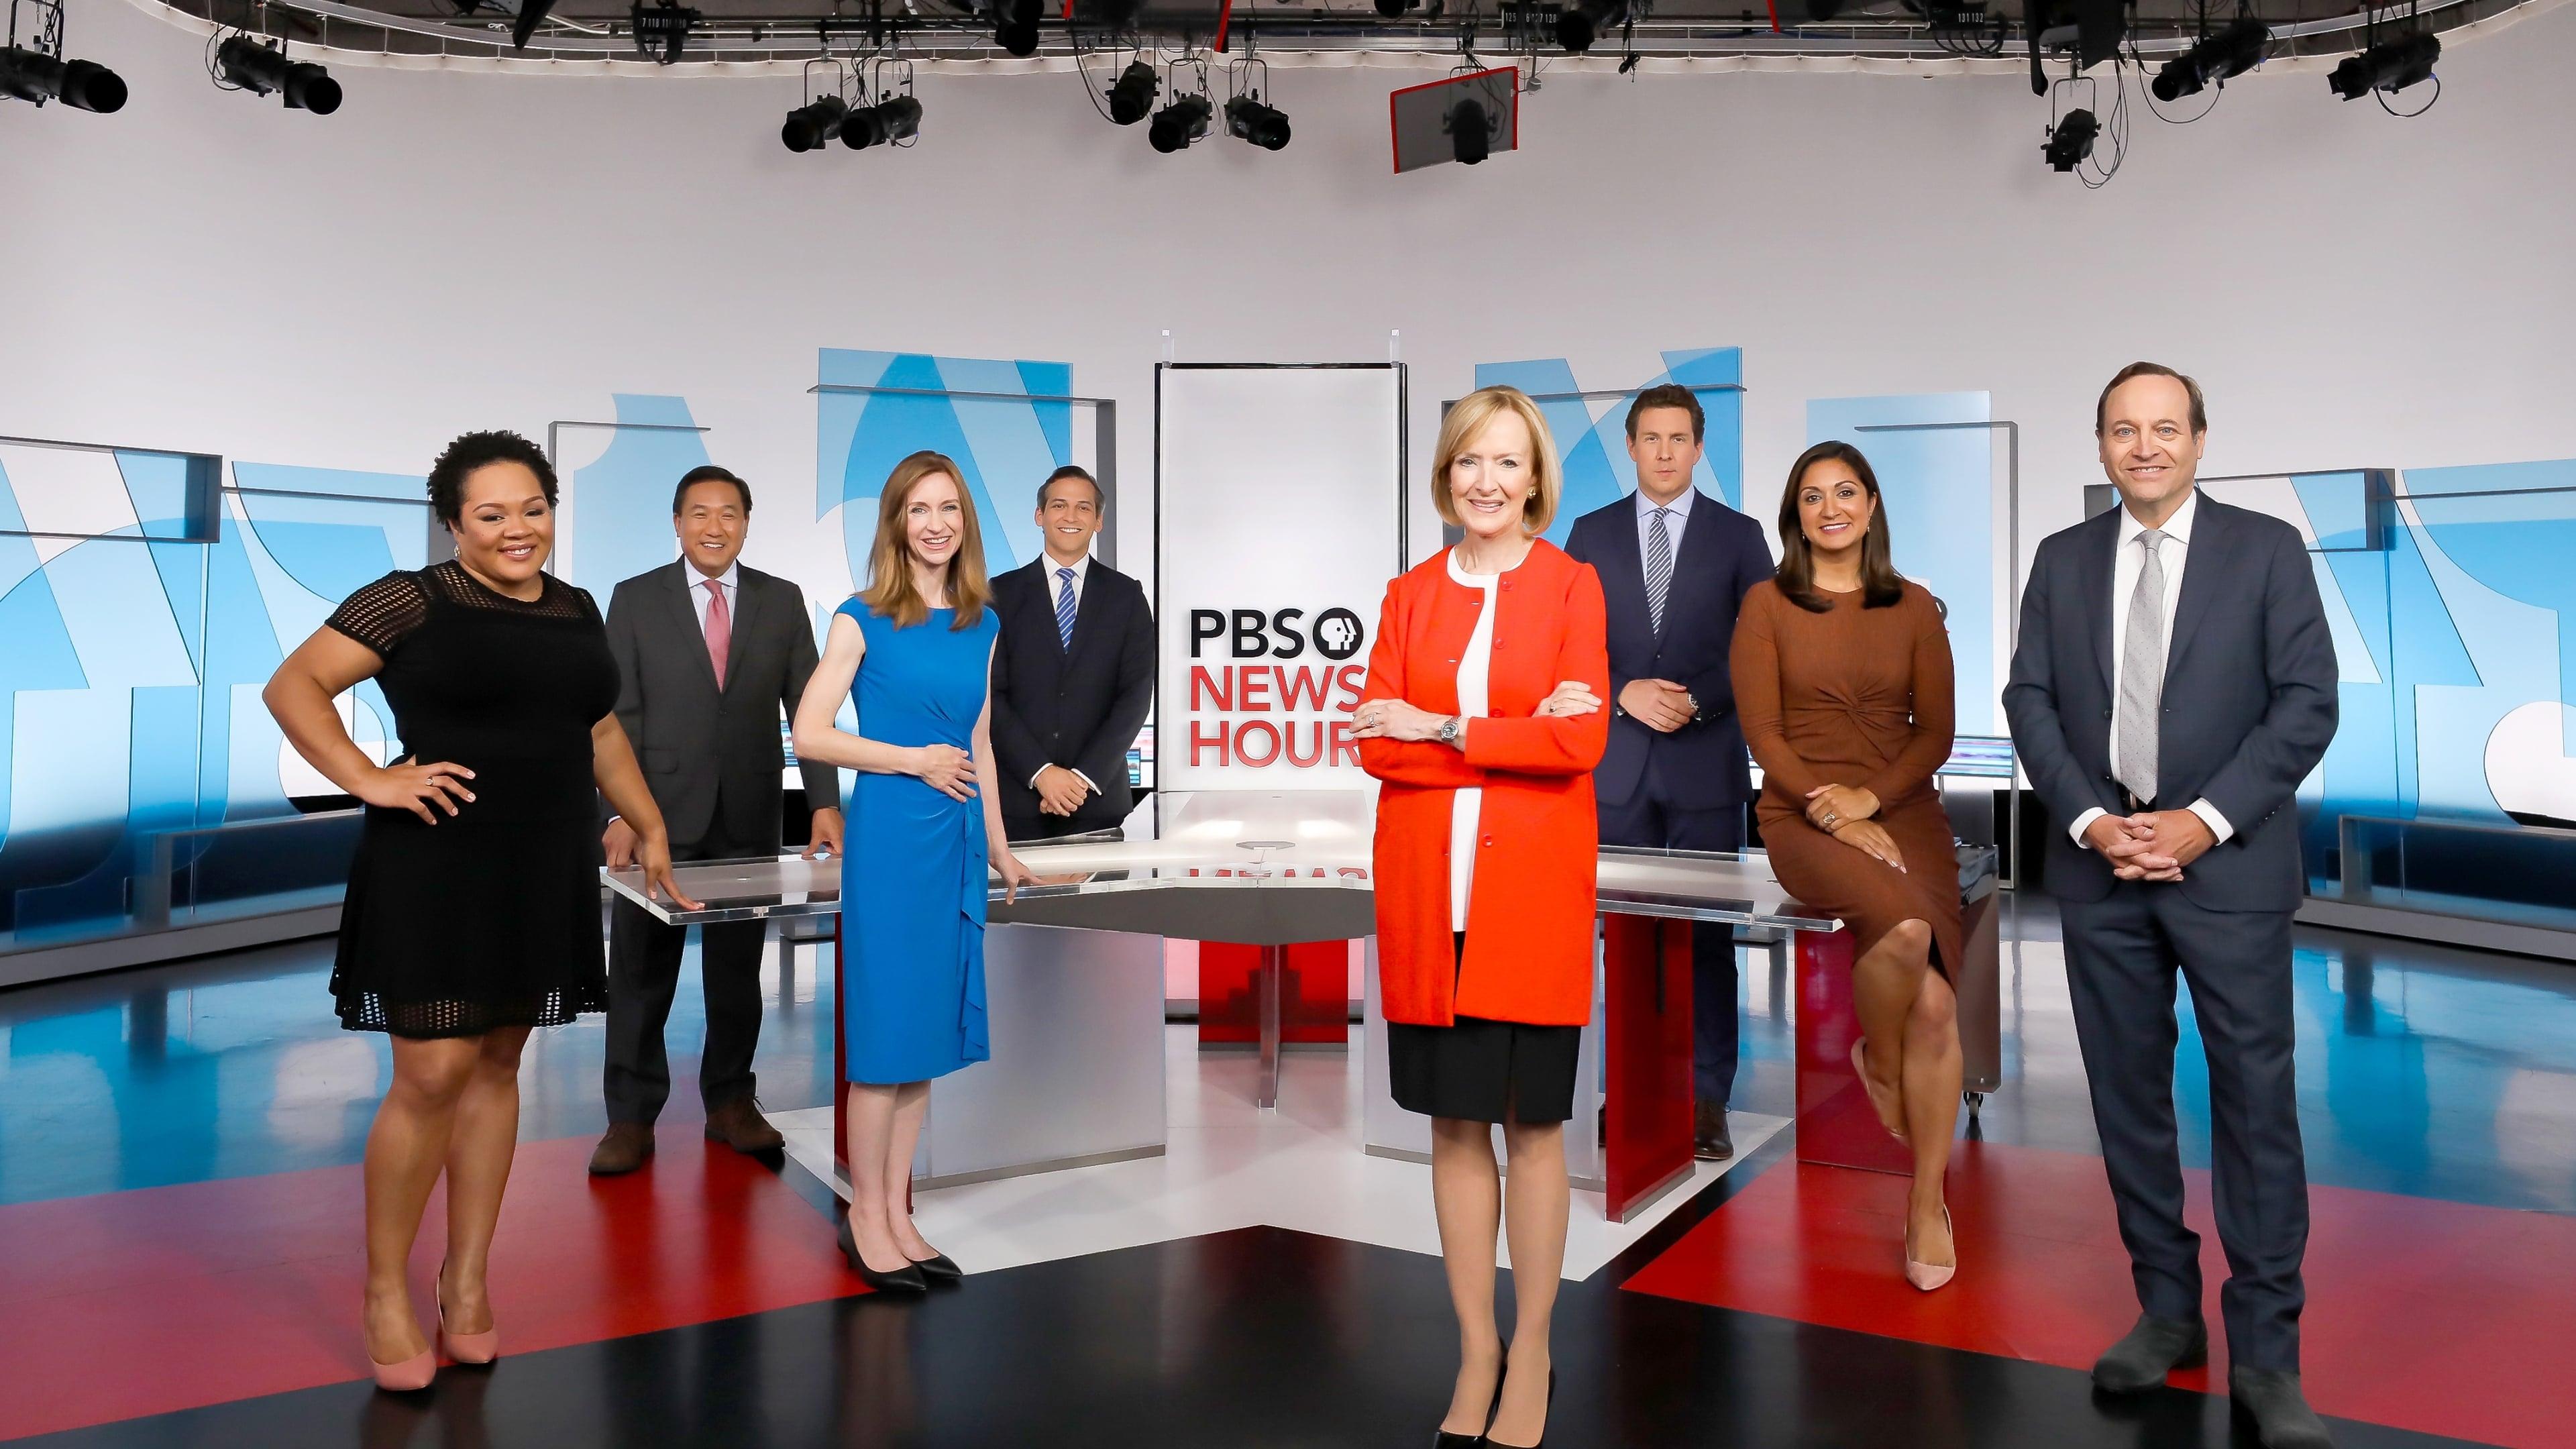 PBS NewsHour - Season 42 Episode 226